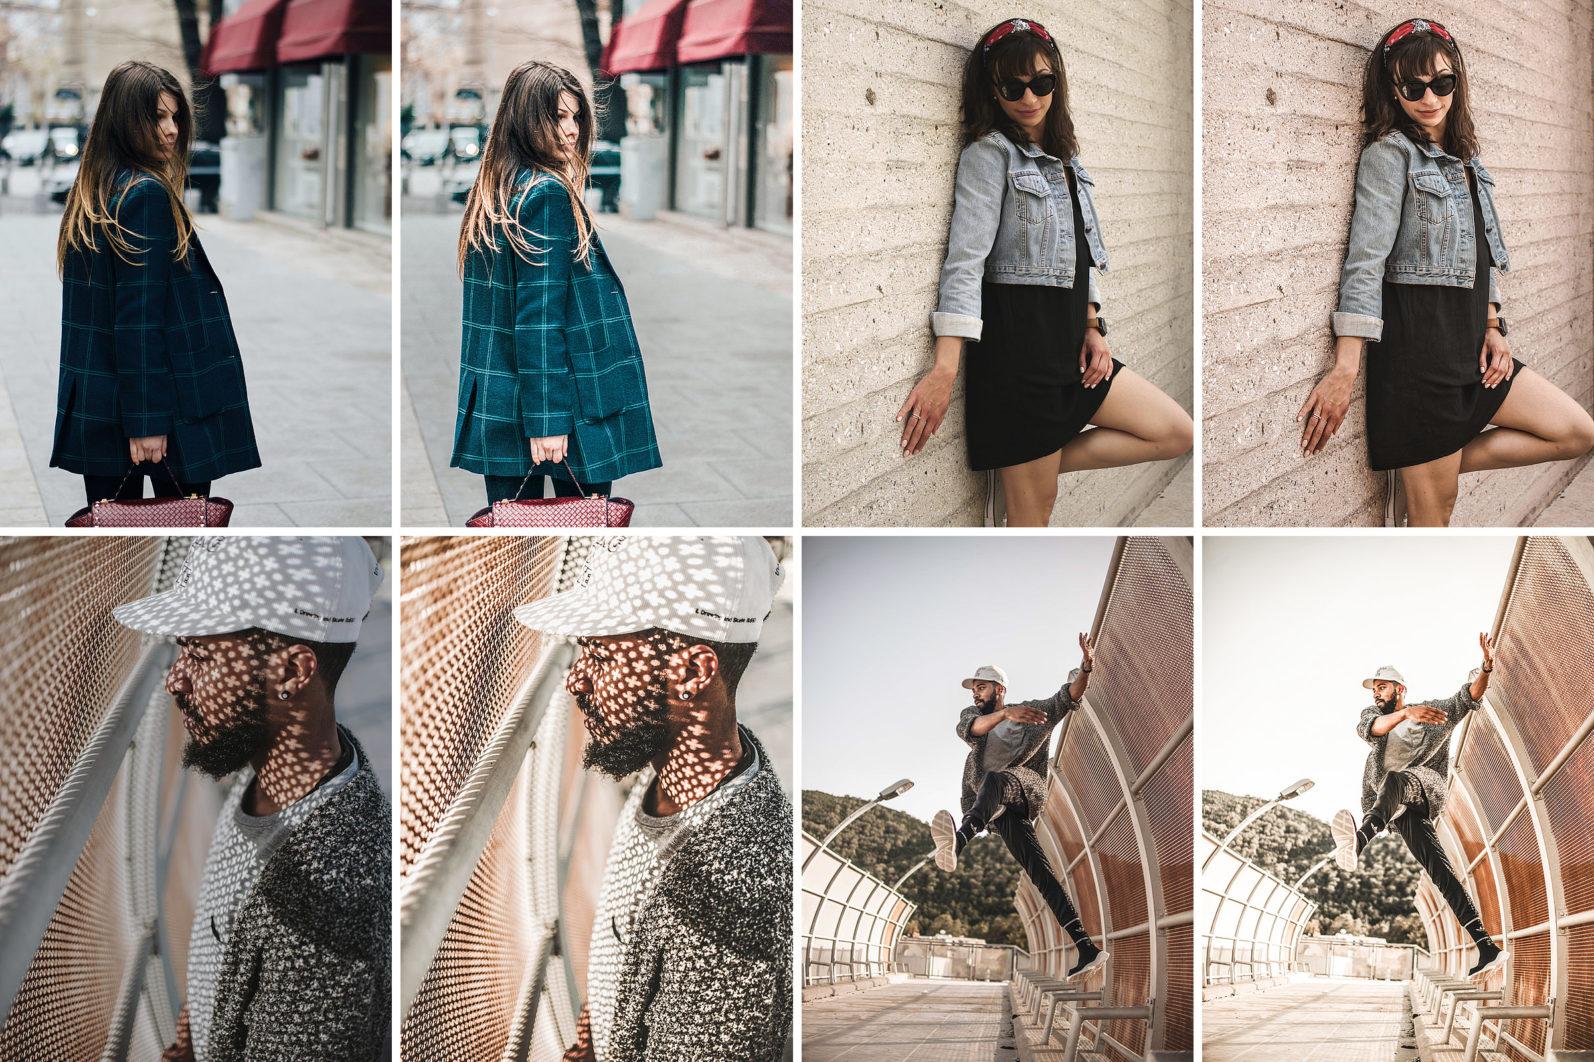 39. Street Fashion - 39.STREETFASHION 2 -